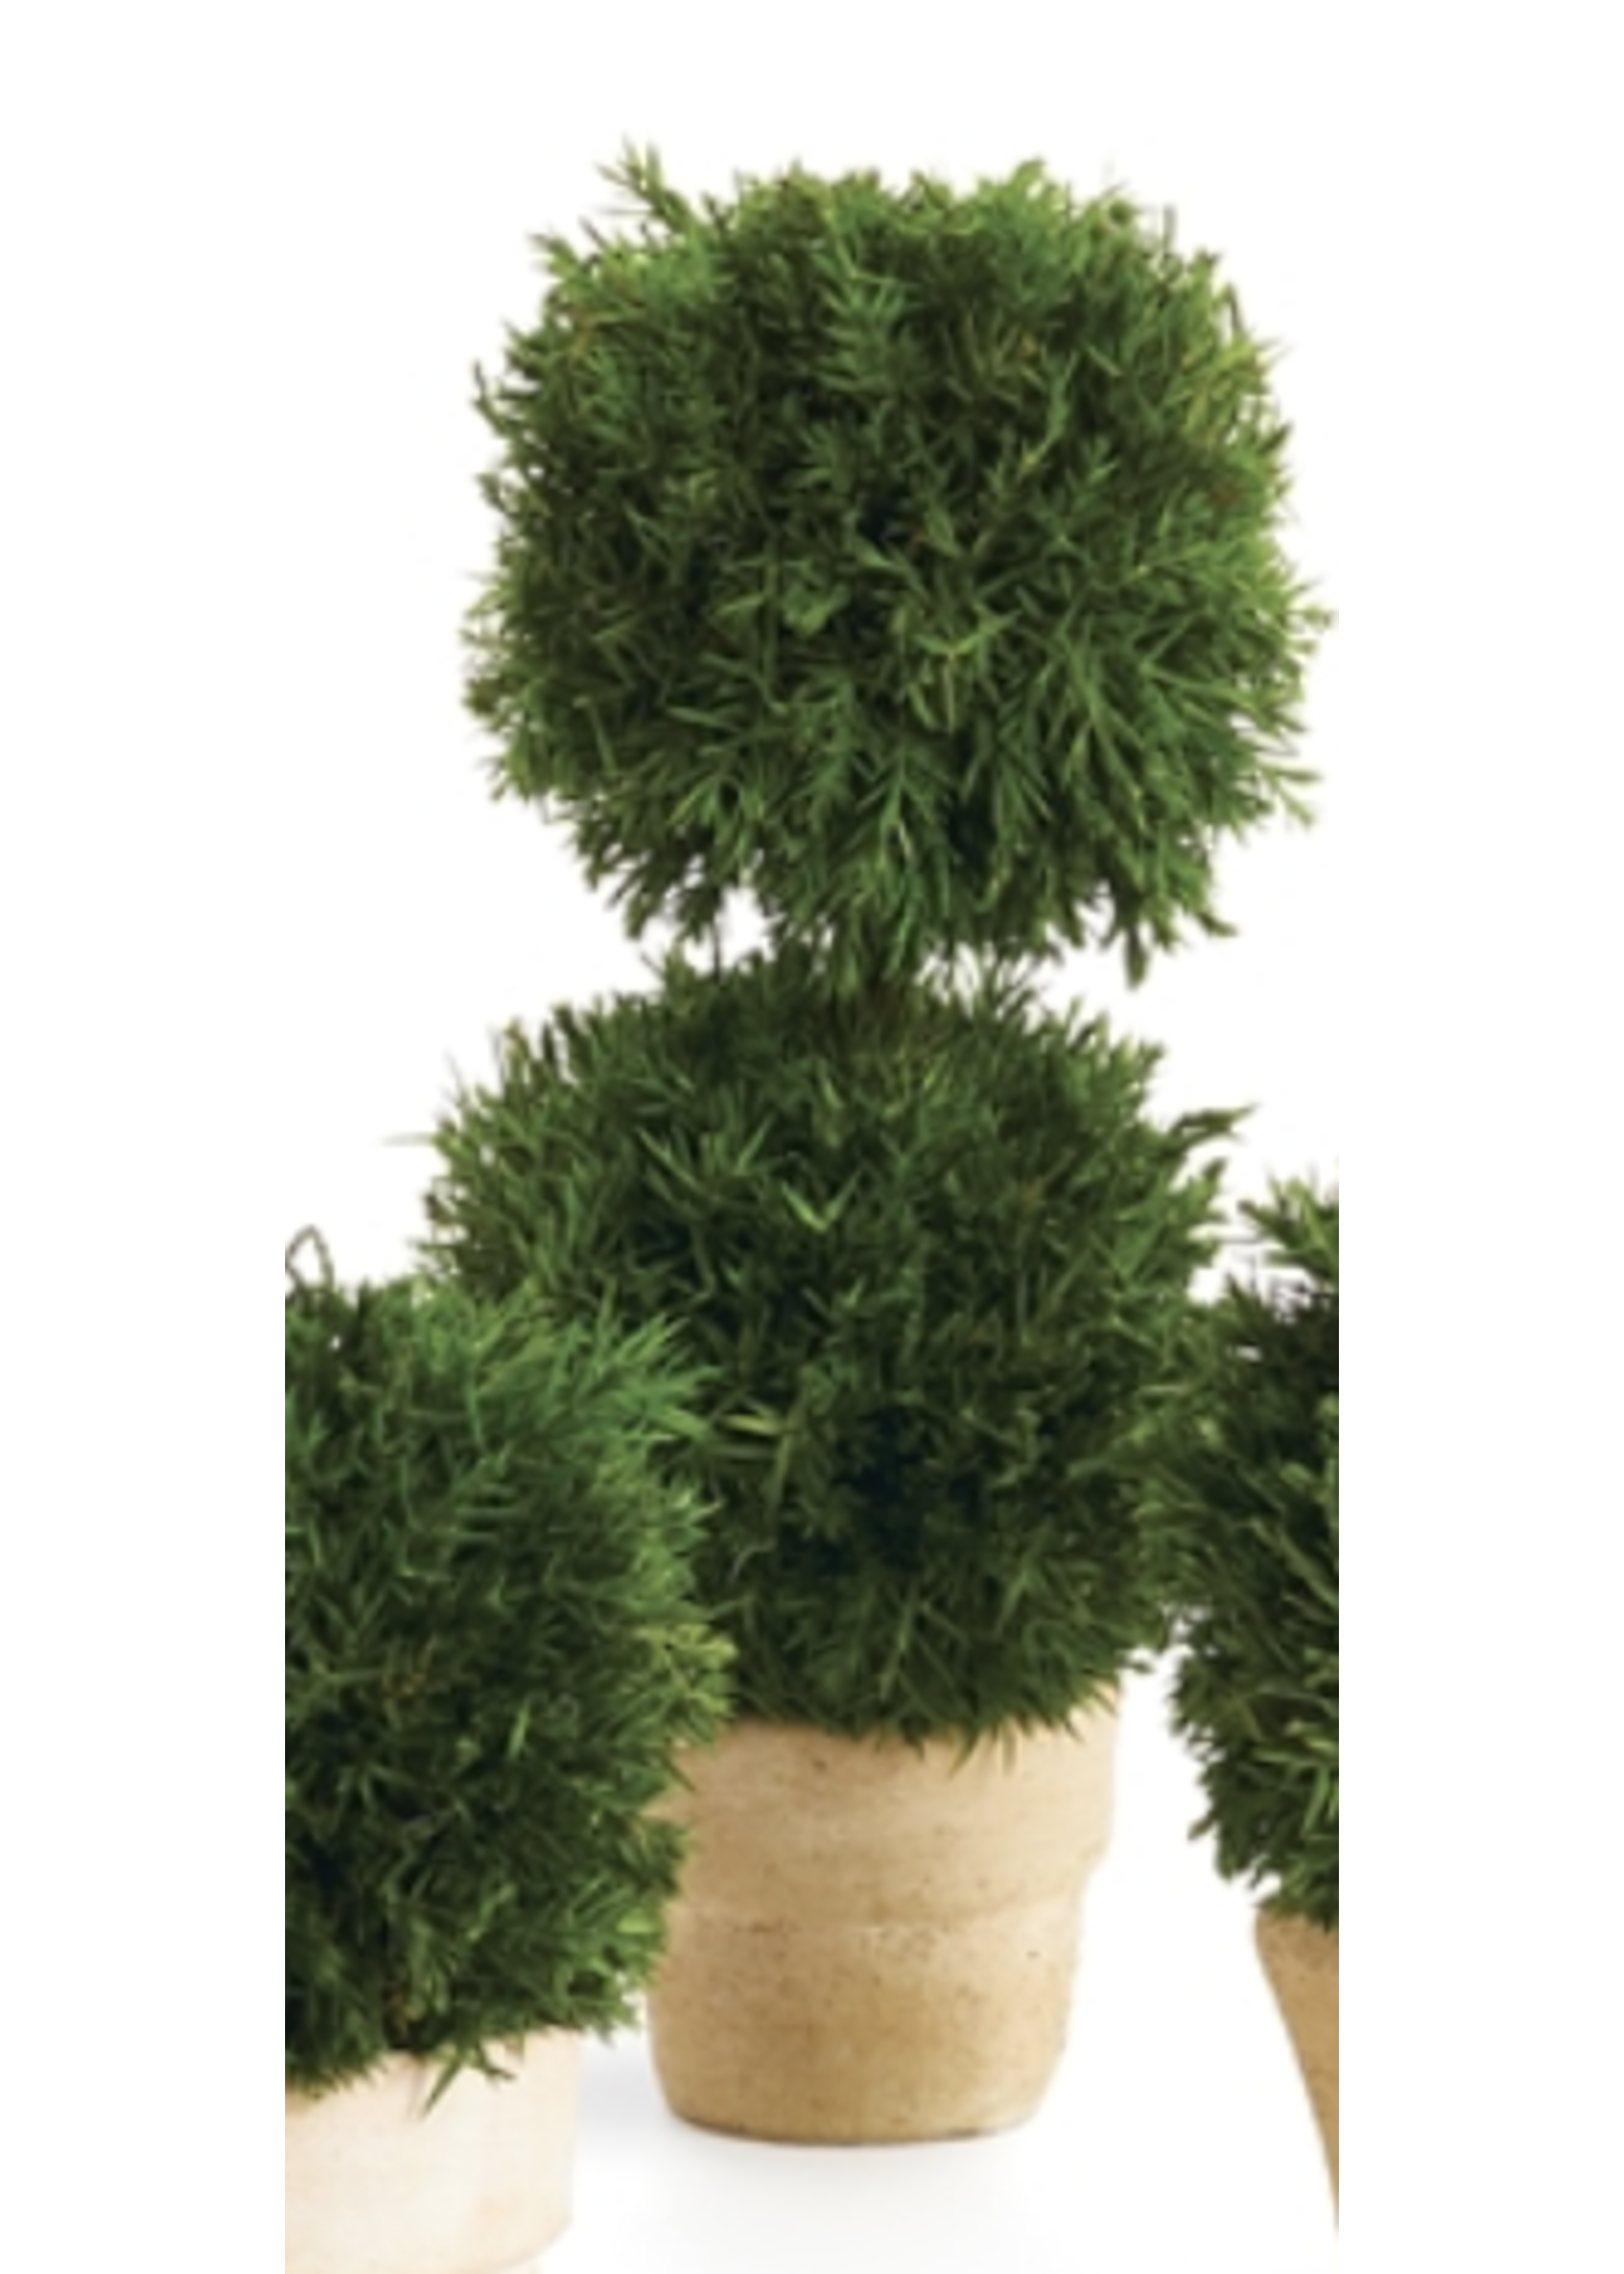 Cypress Mini Topiary in Pot - Double Ball